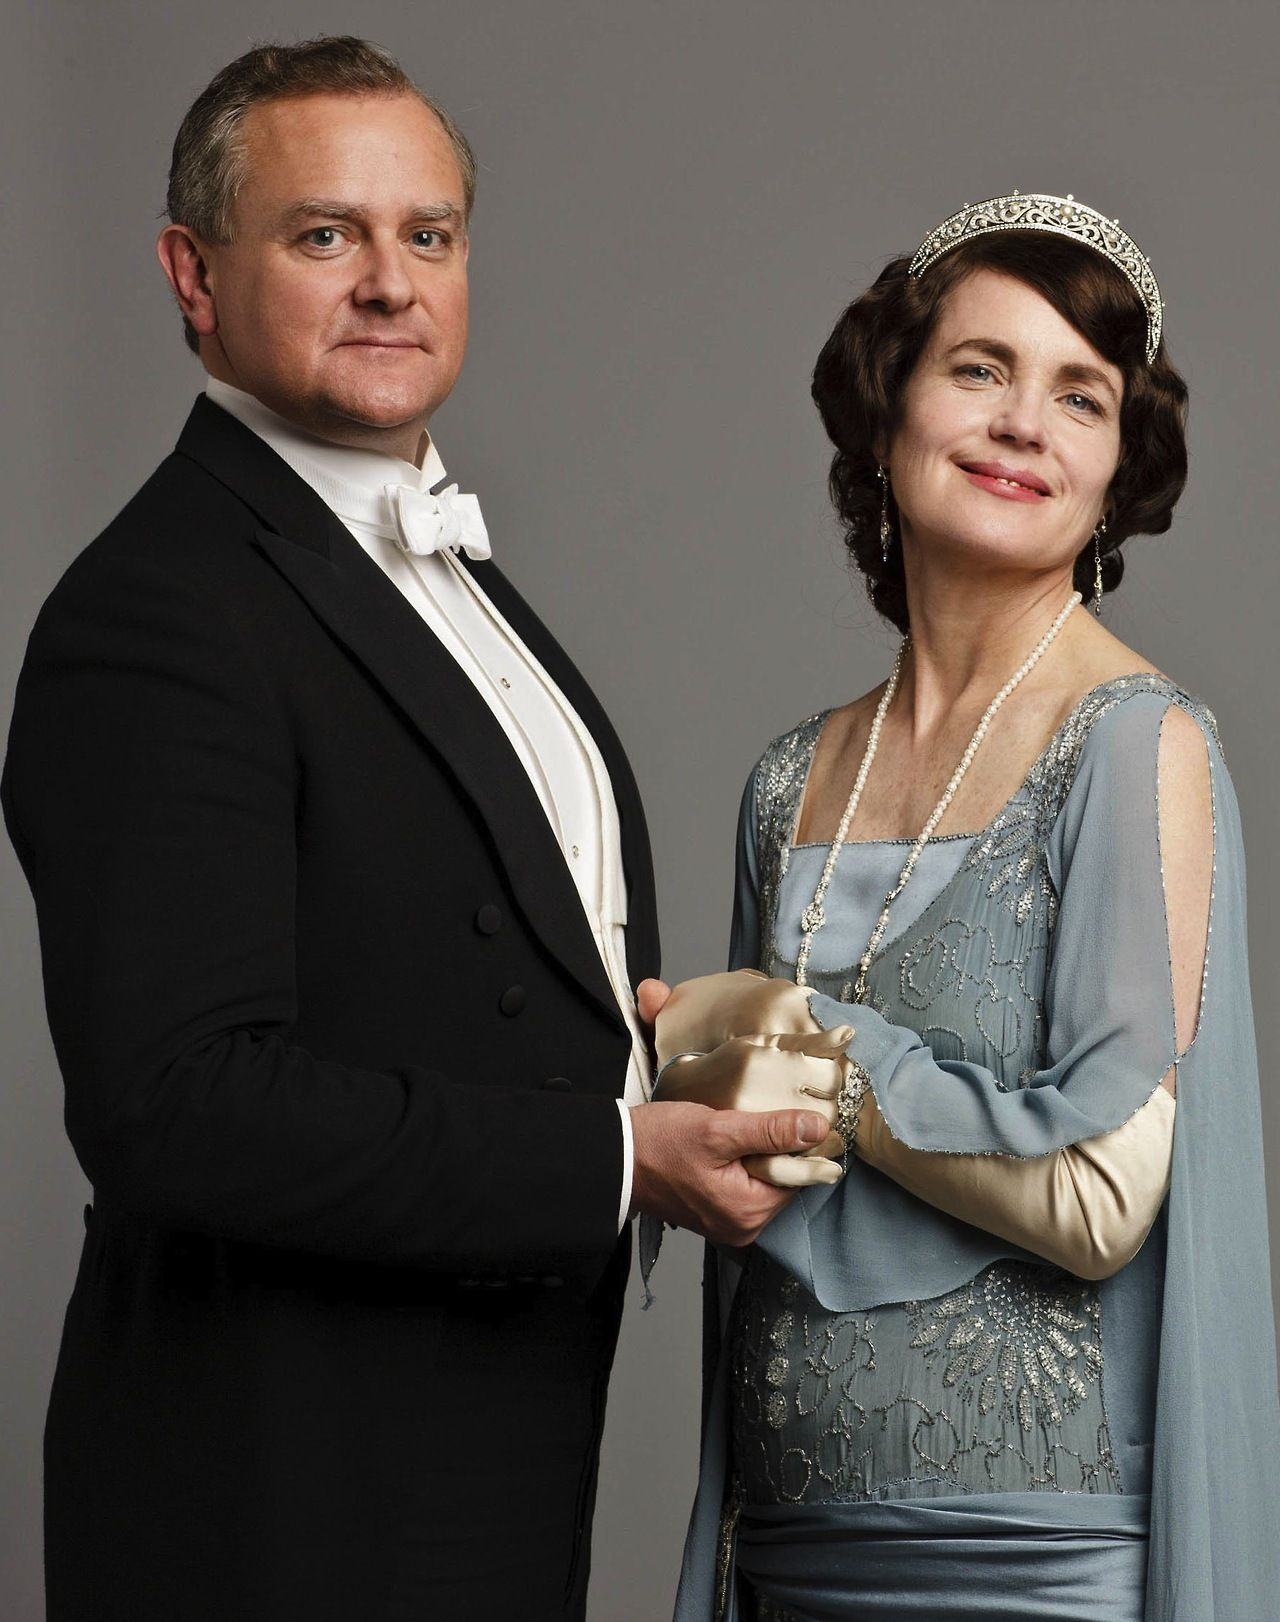 Lord Robert Crawley, 5th Earl of Grantham and Lady Cora Crawley, Countess of Grantham